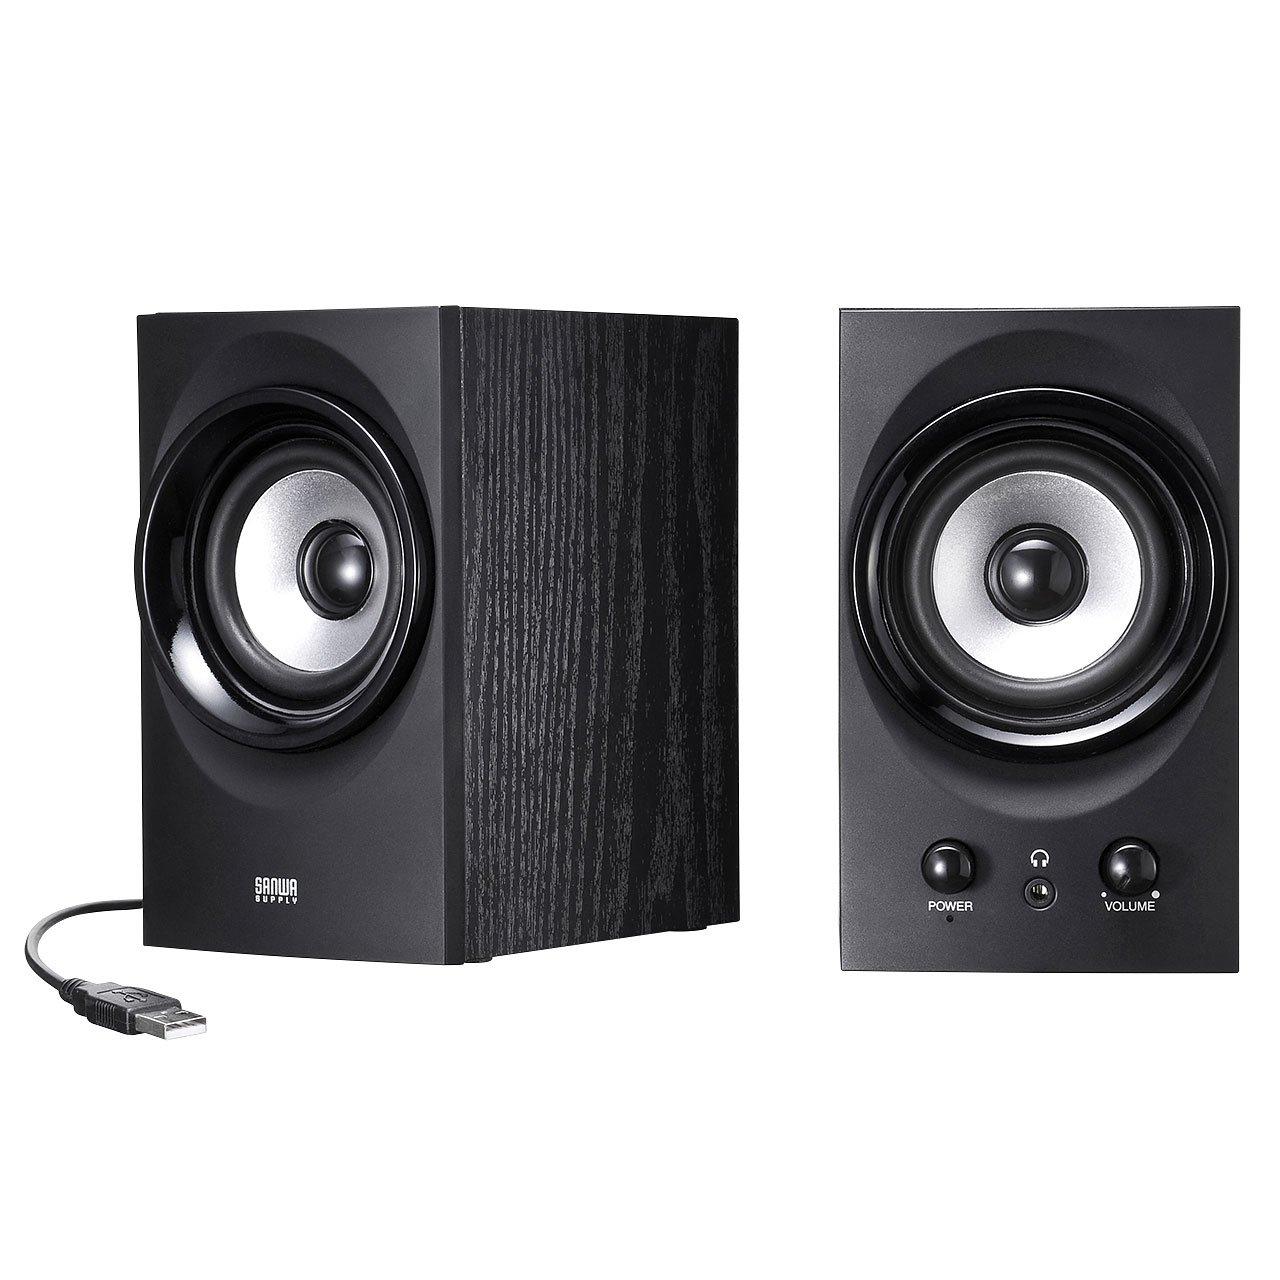 SANWA SUPPLY high-power USB speaker MM-SPU9BK (Black) by Sanwa (Image #1)